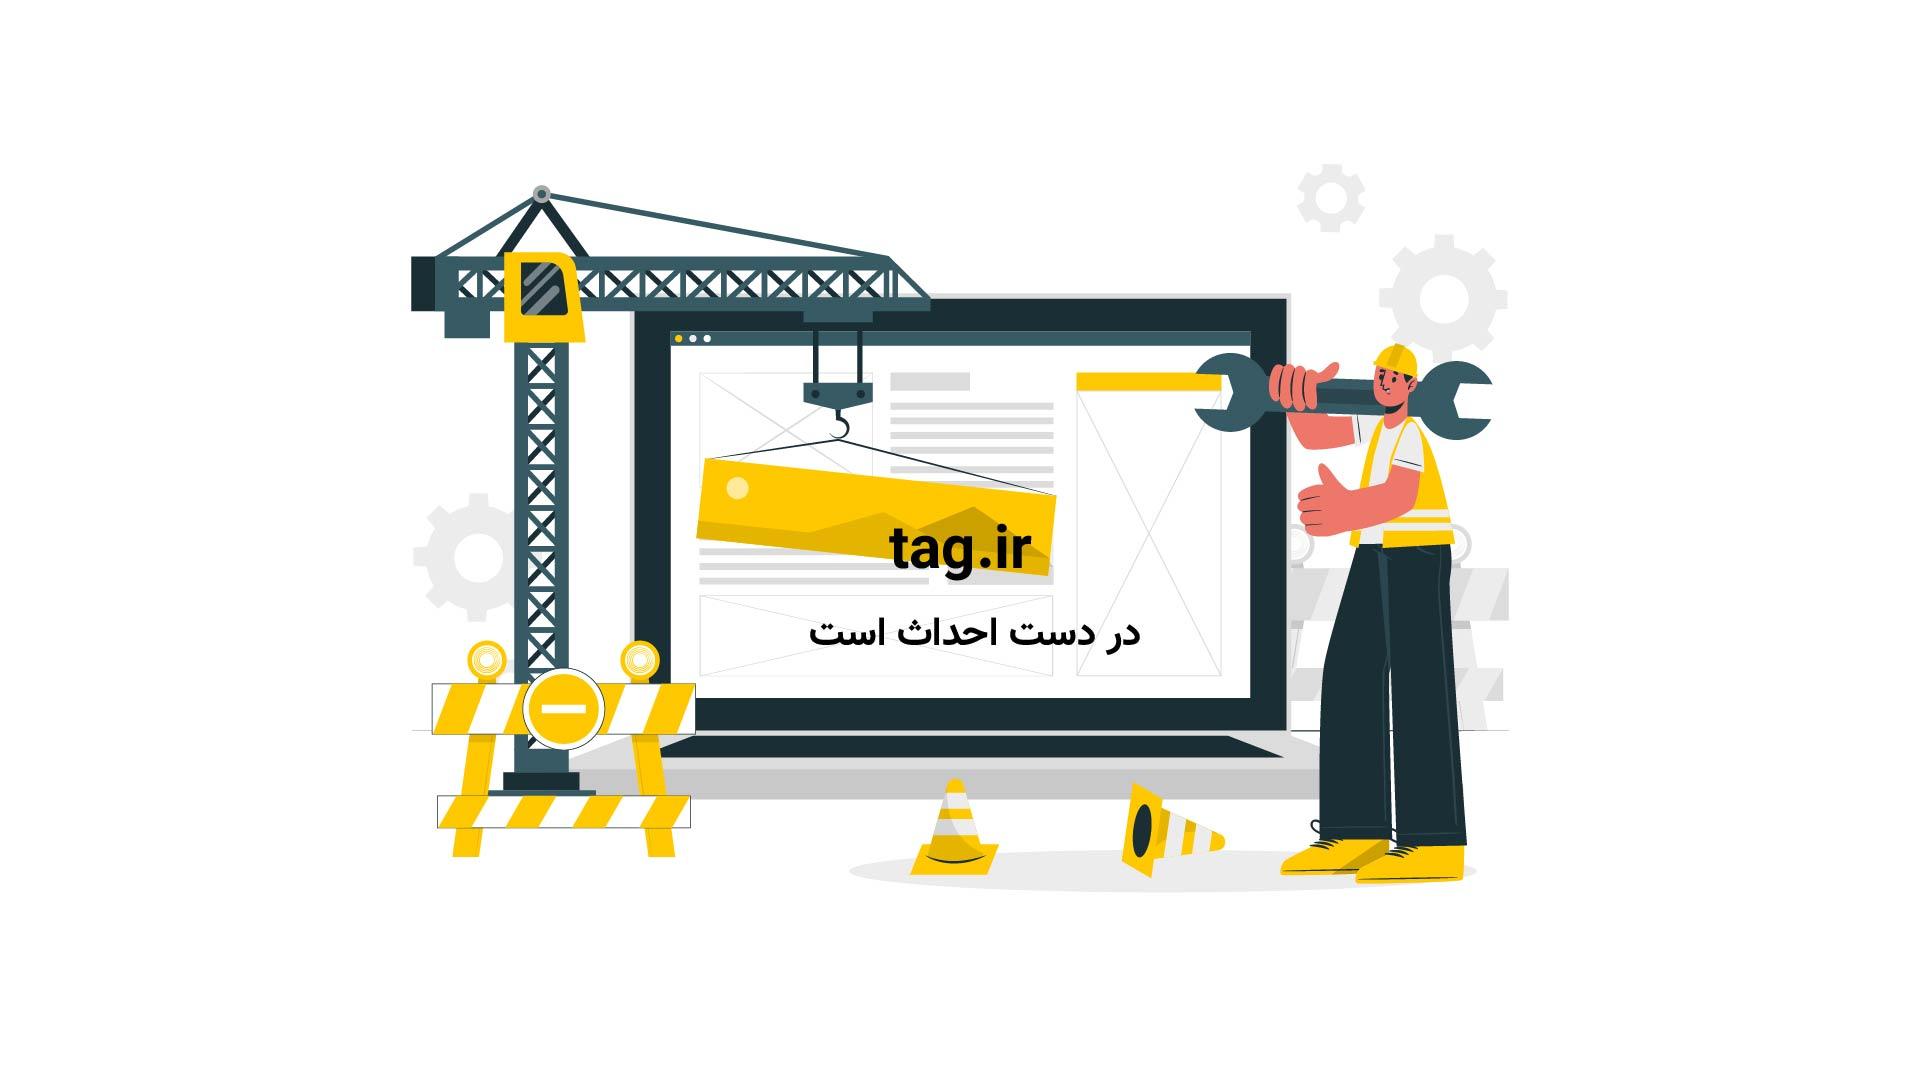 دکتر ماریو | تگ